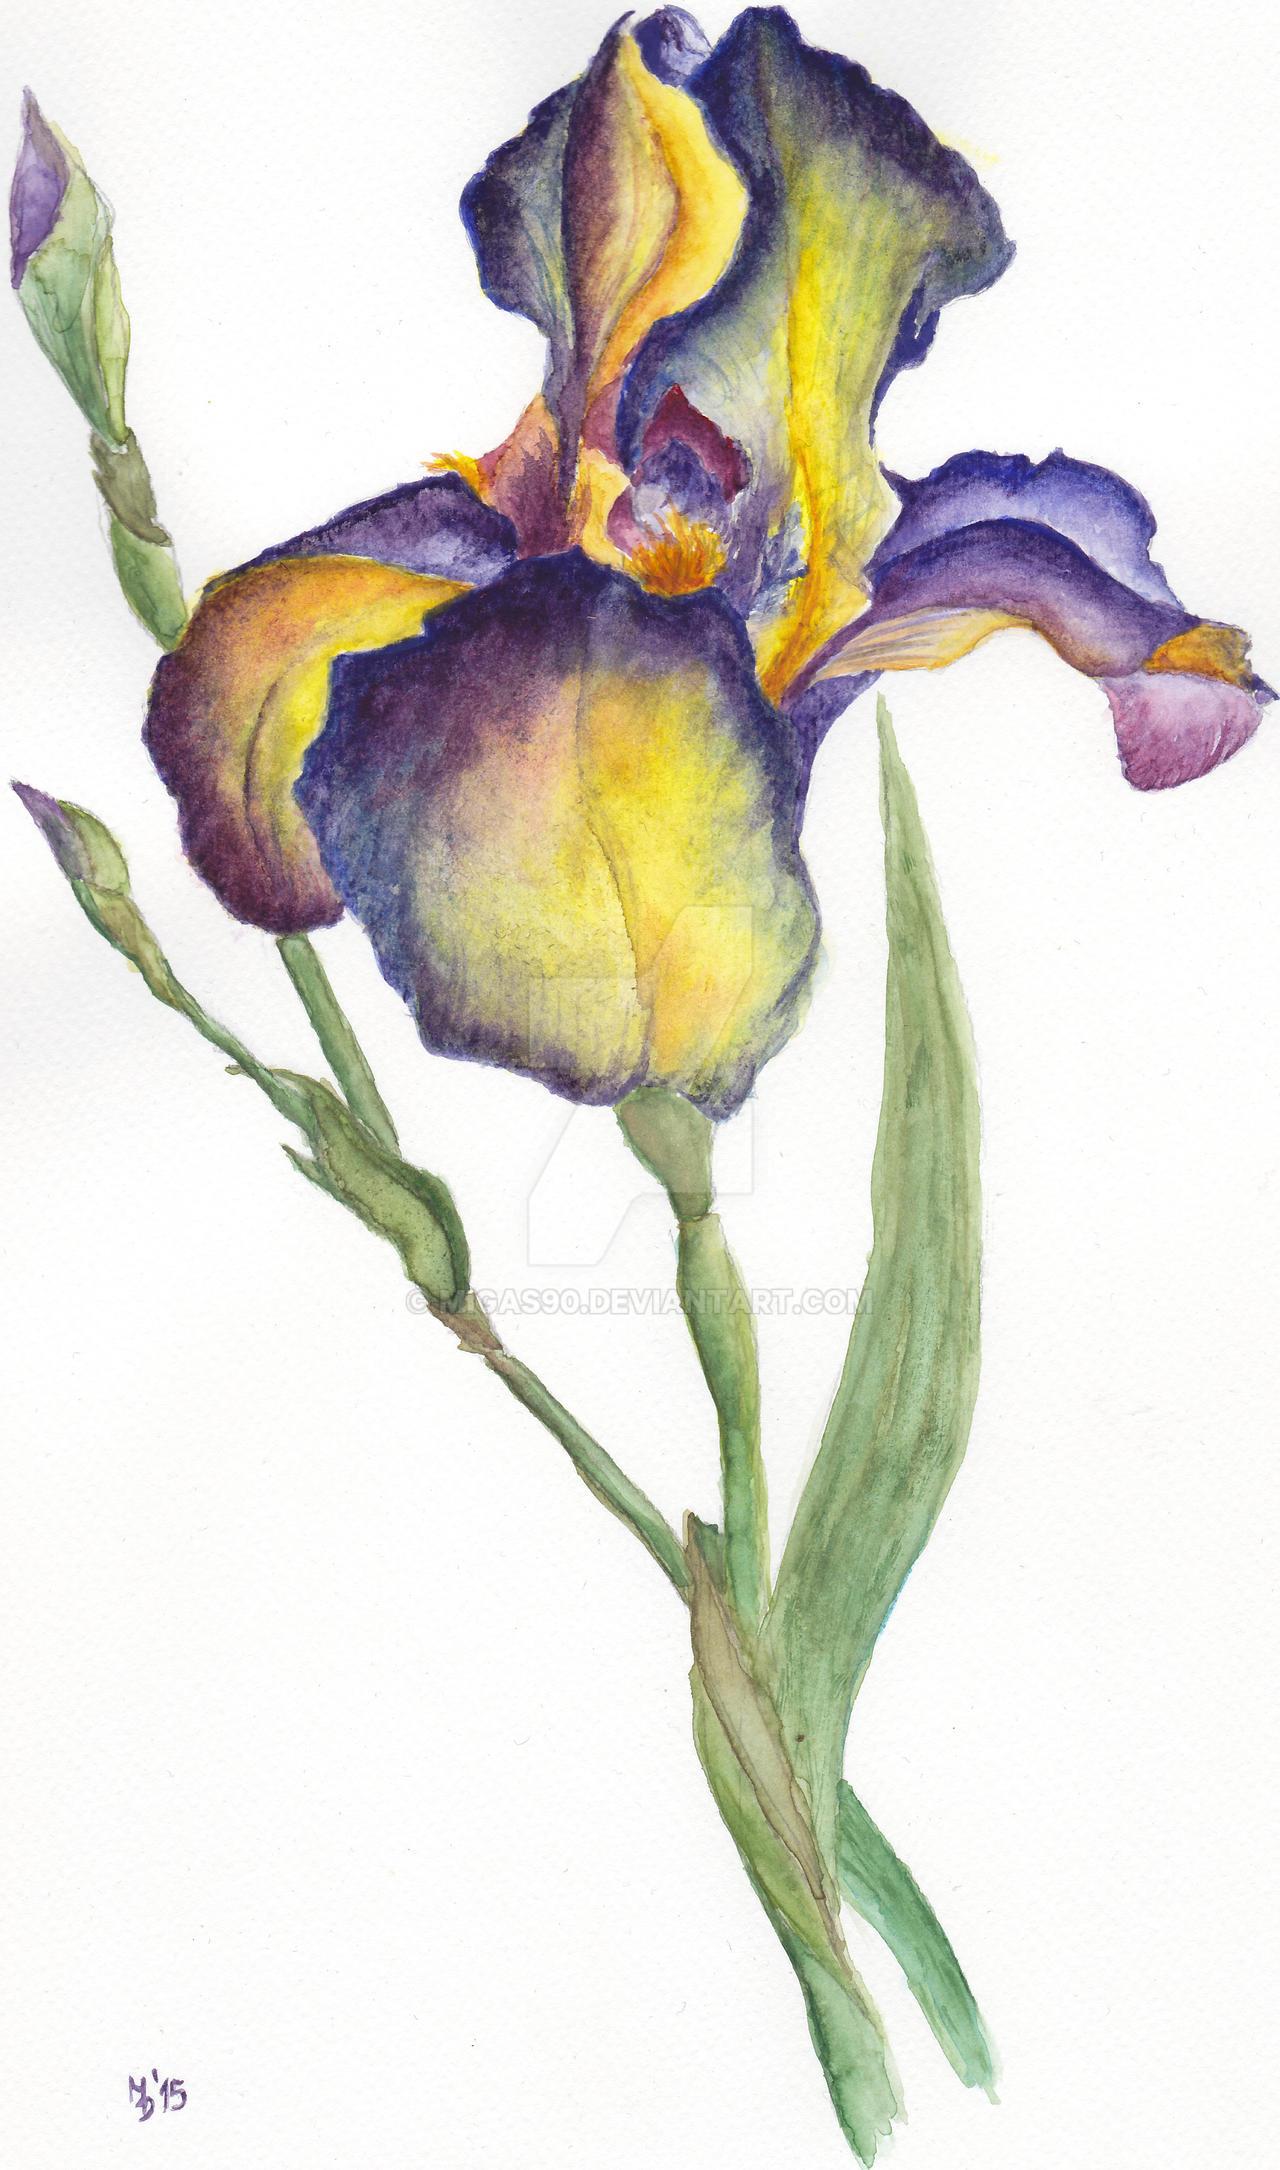 Iris 'Beauty'